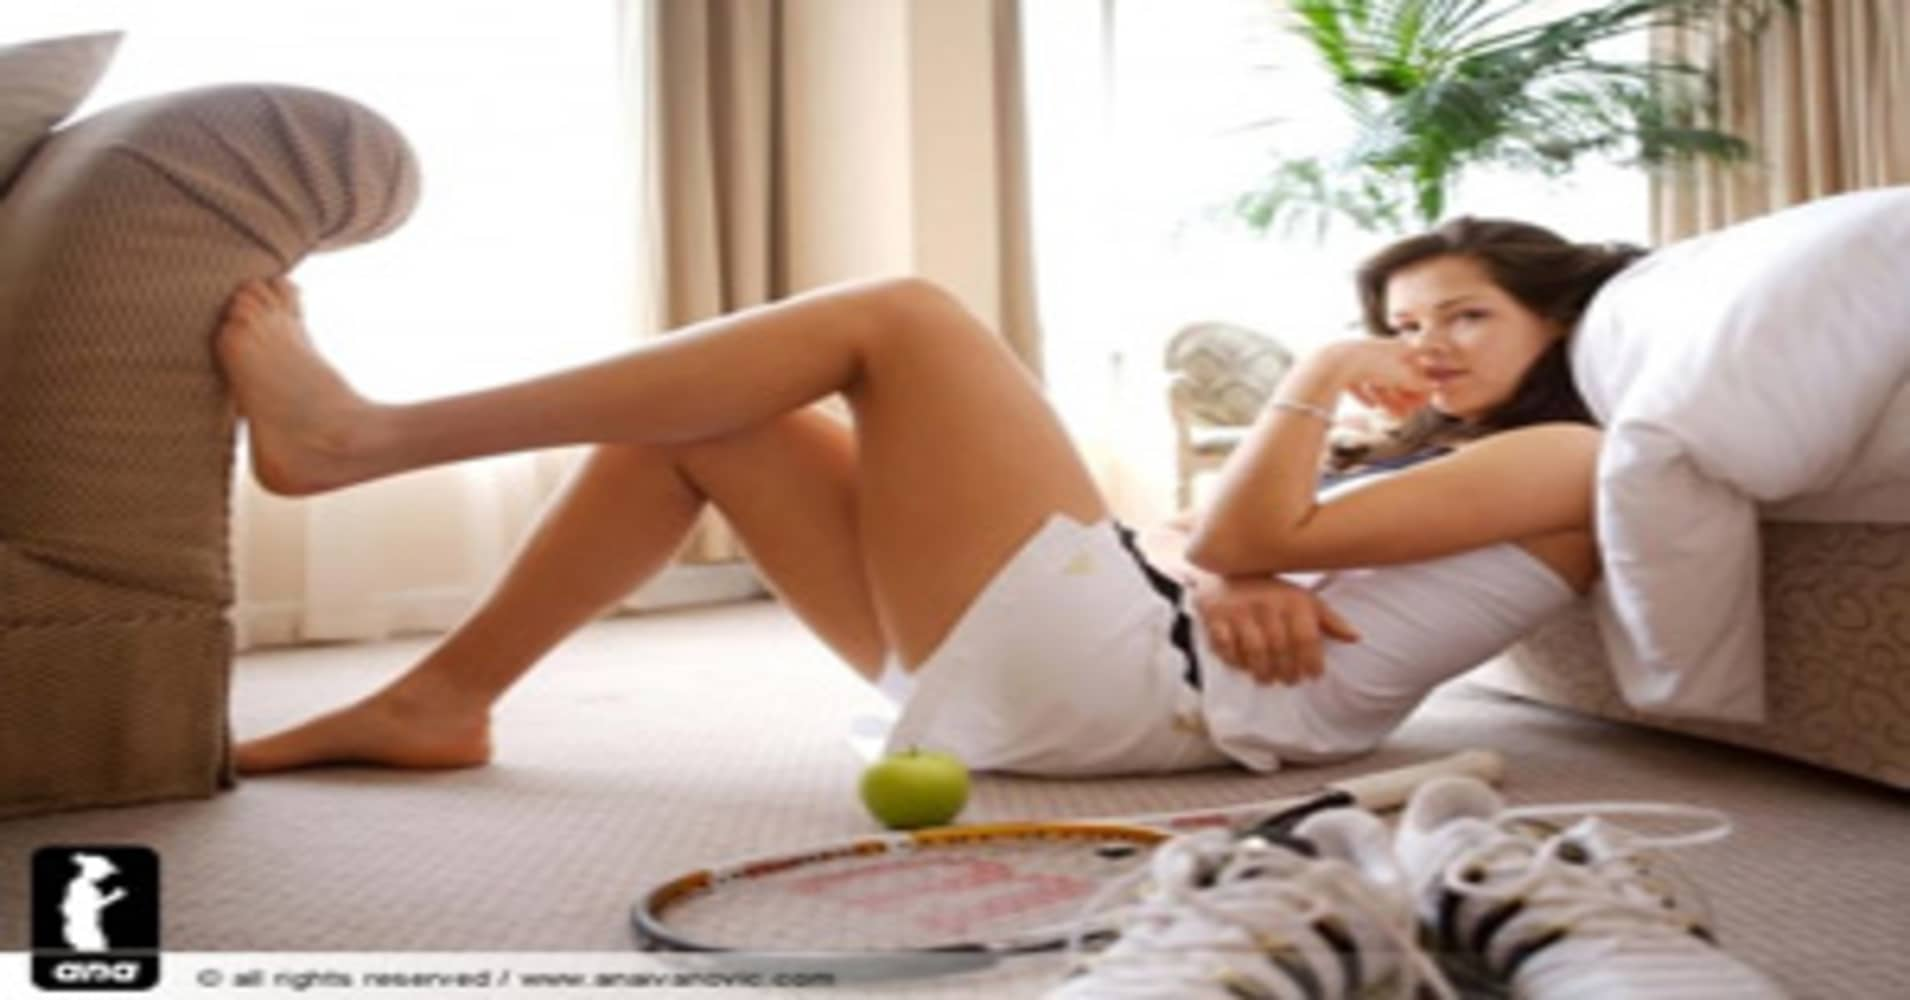 Ana Ivanovic Feet ana ivanovic: you're my favorite (beautiful) athlete